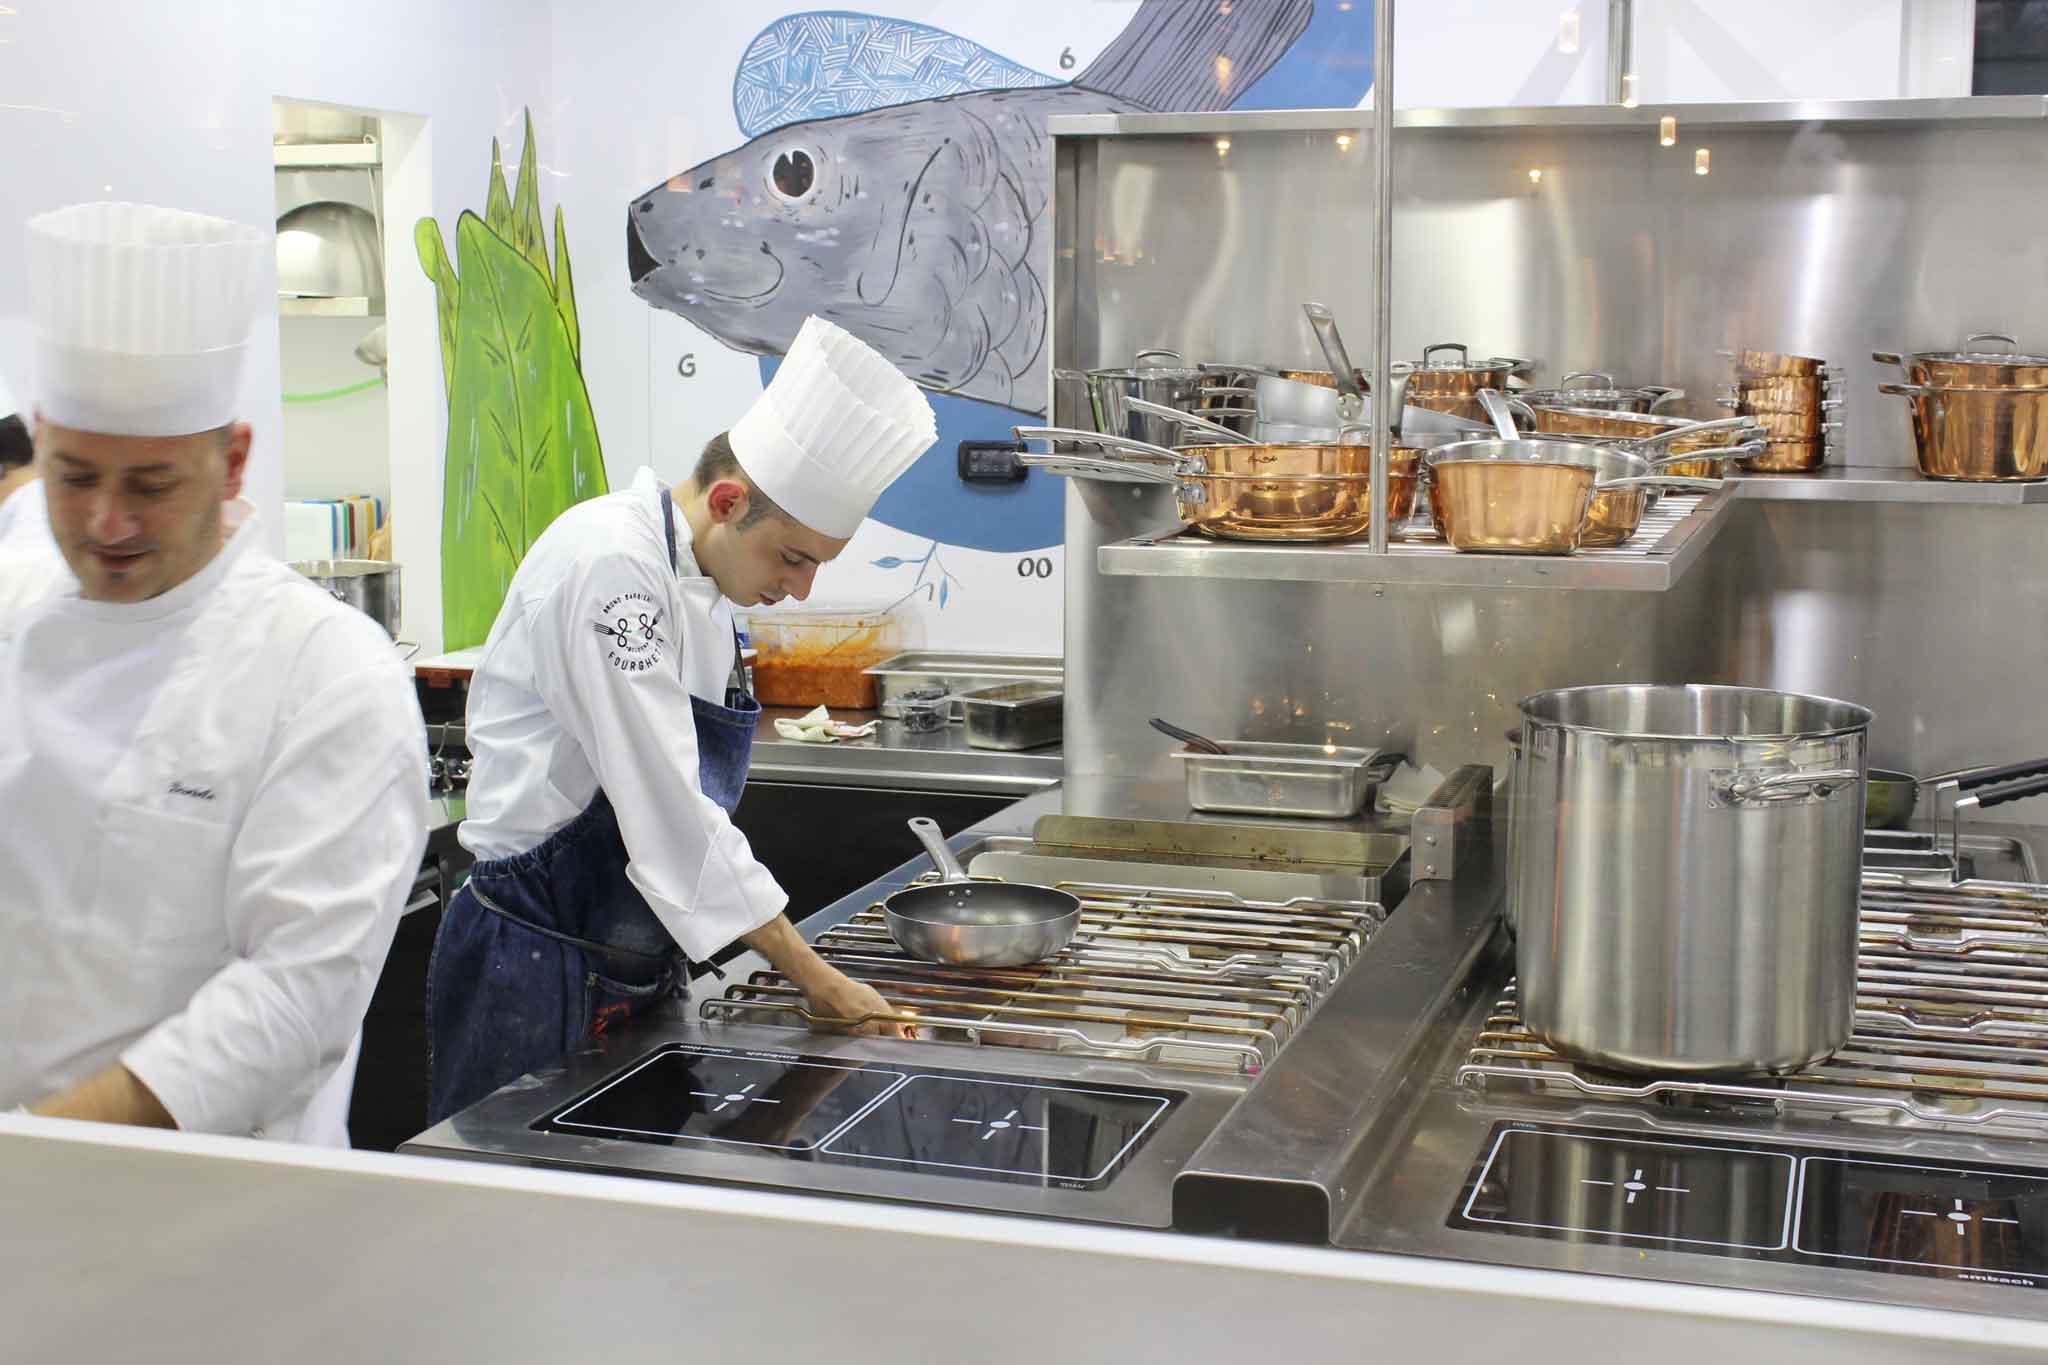 Fourghetti ristorante Barbieri cucina a vista